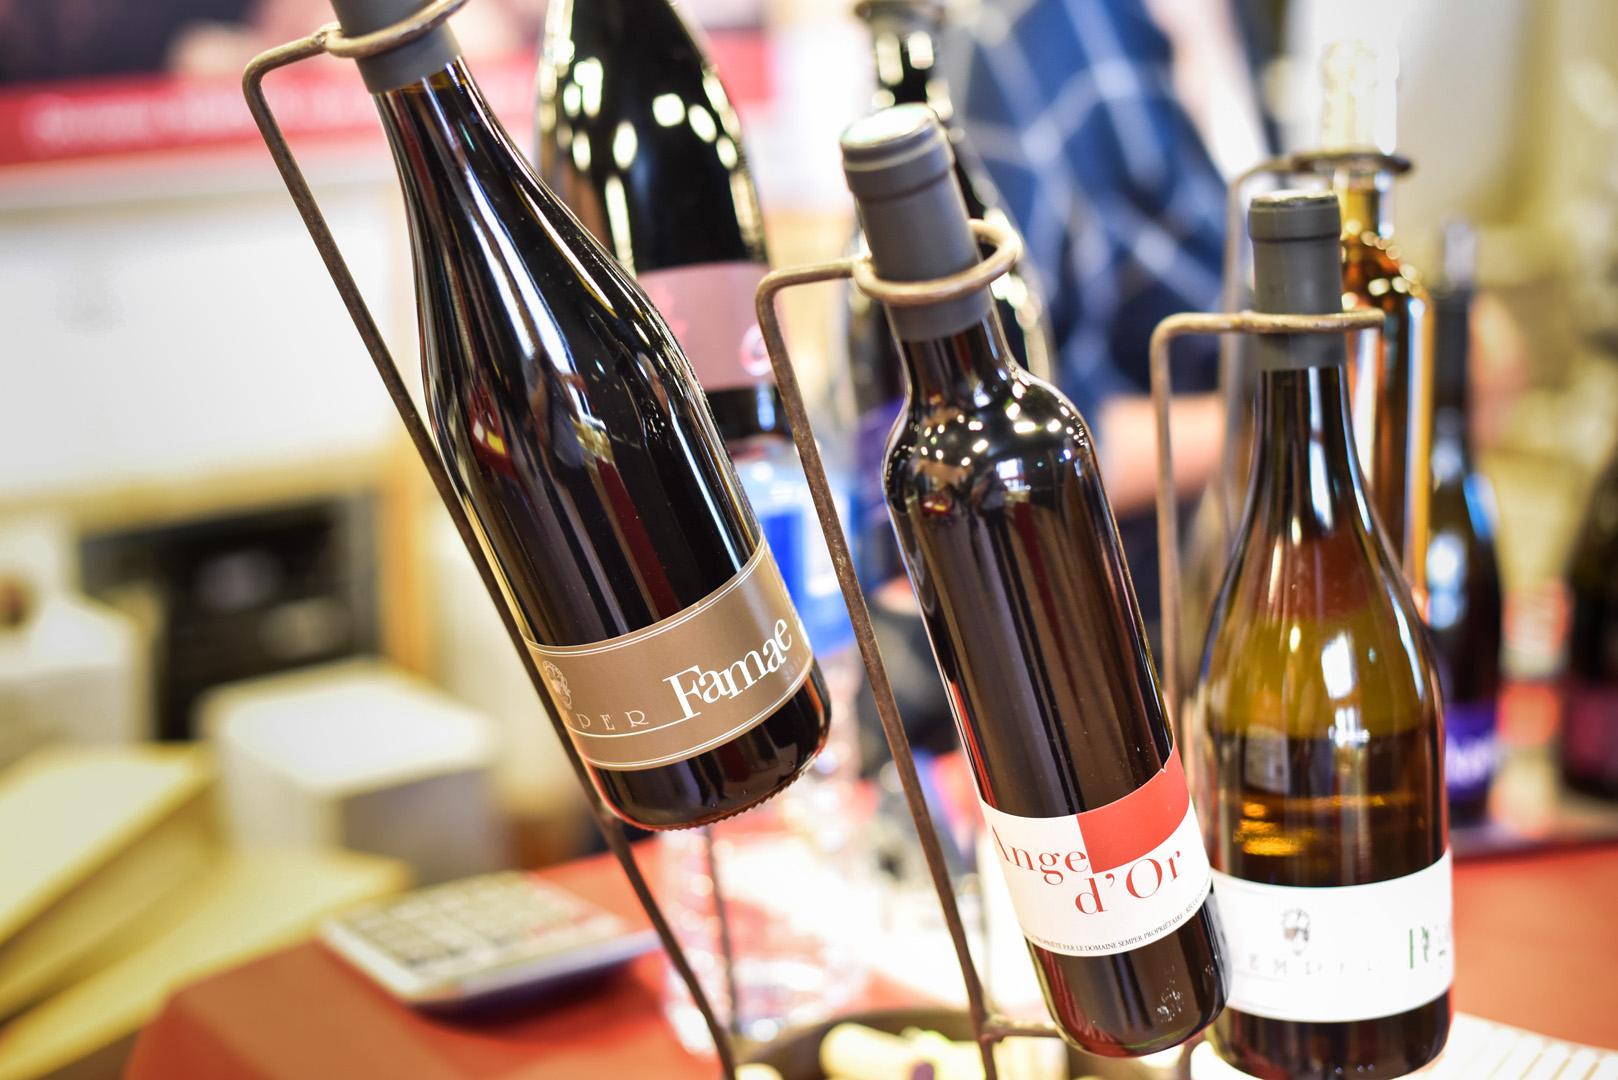 Vinomedia, salon du vin